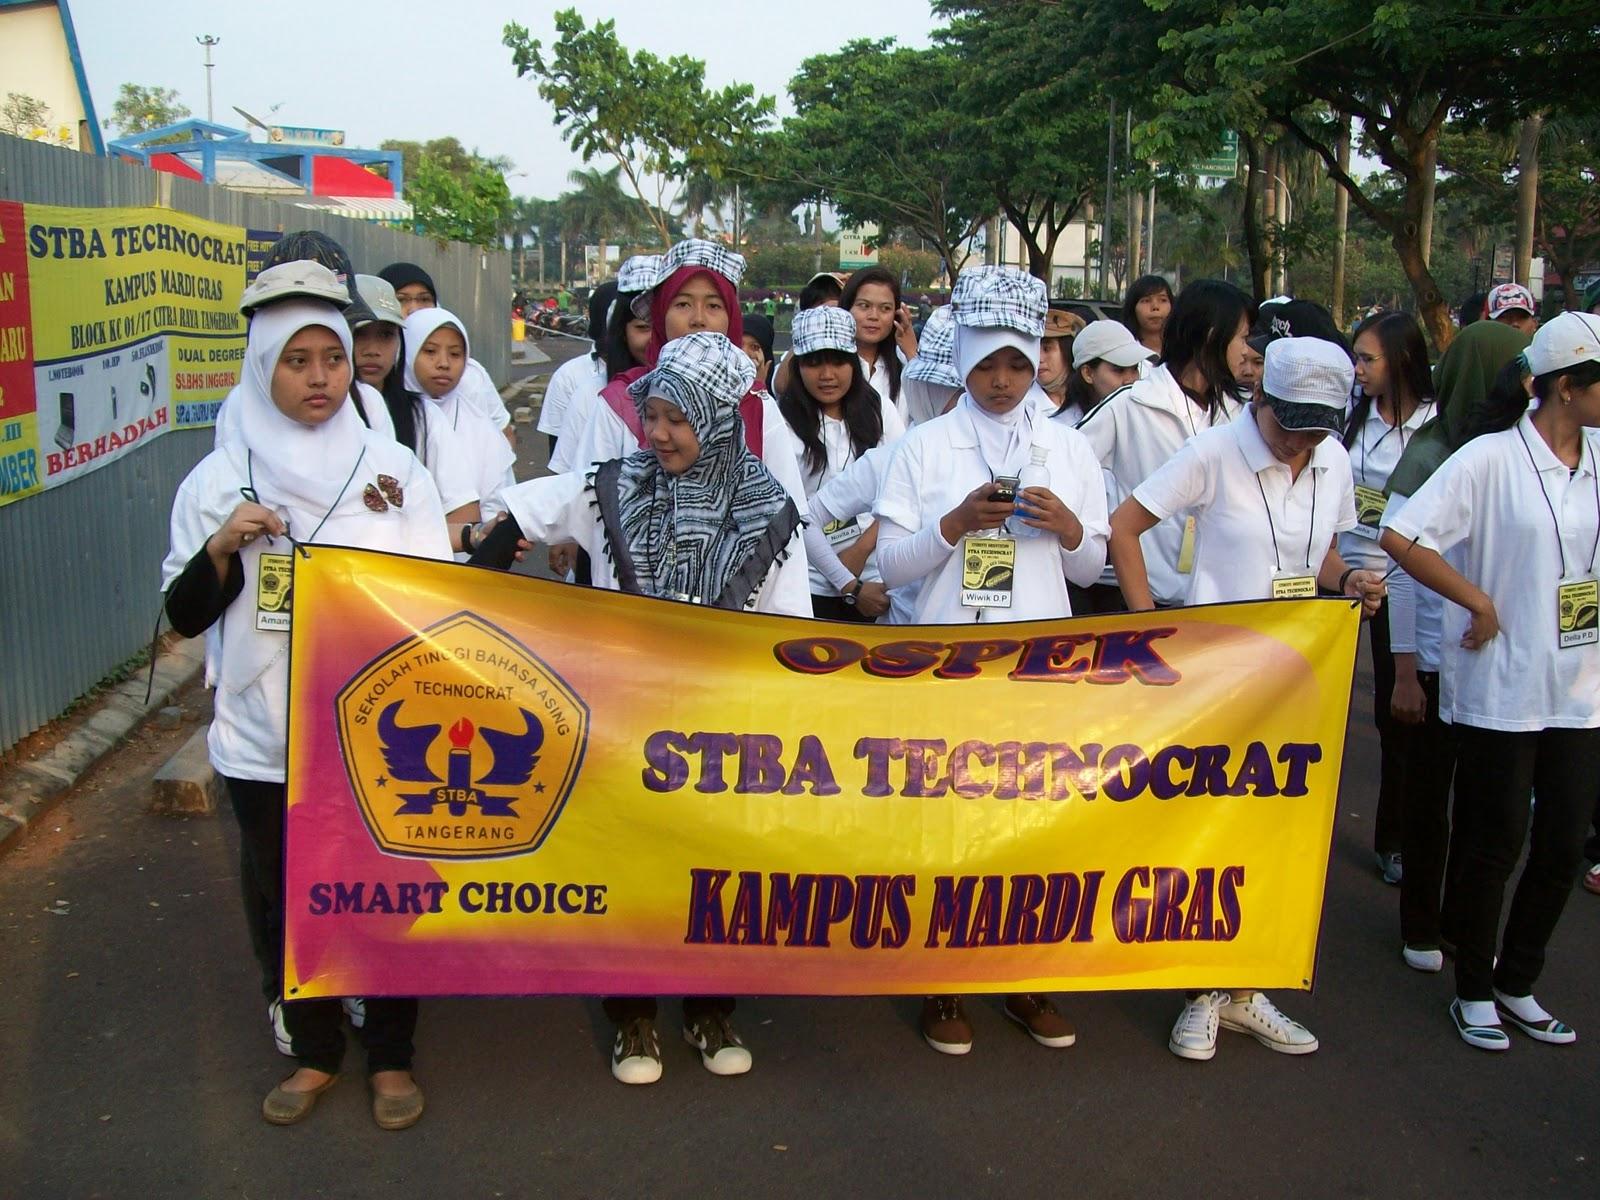 Kegiatan Kampus Stba Technocrat Kampus Mardi Gras